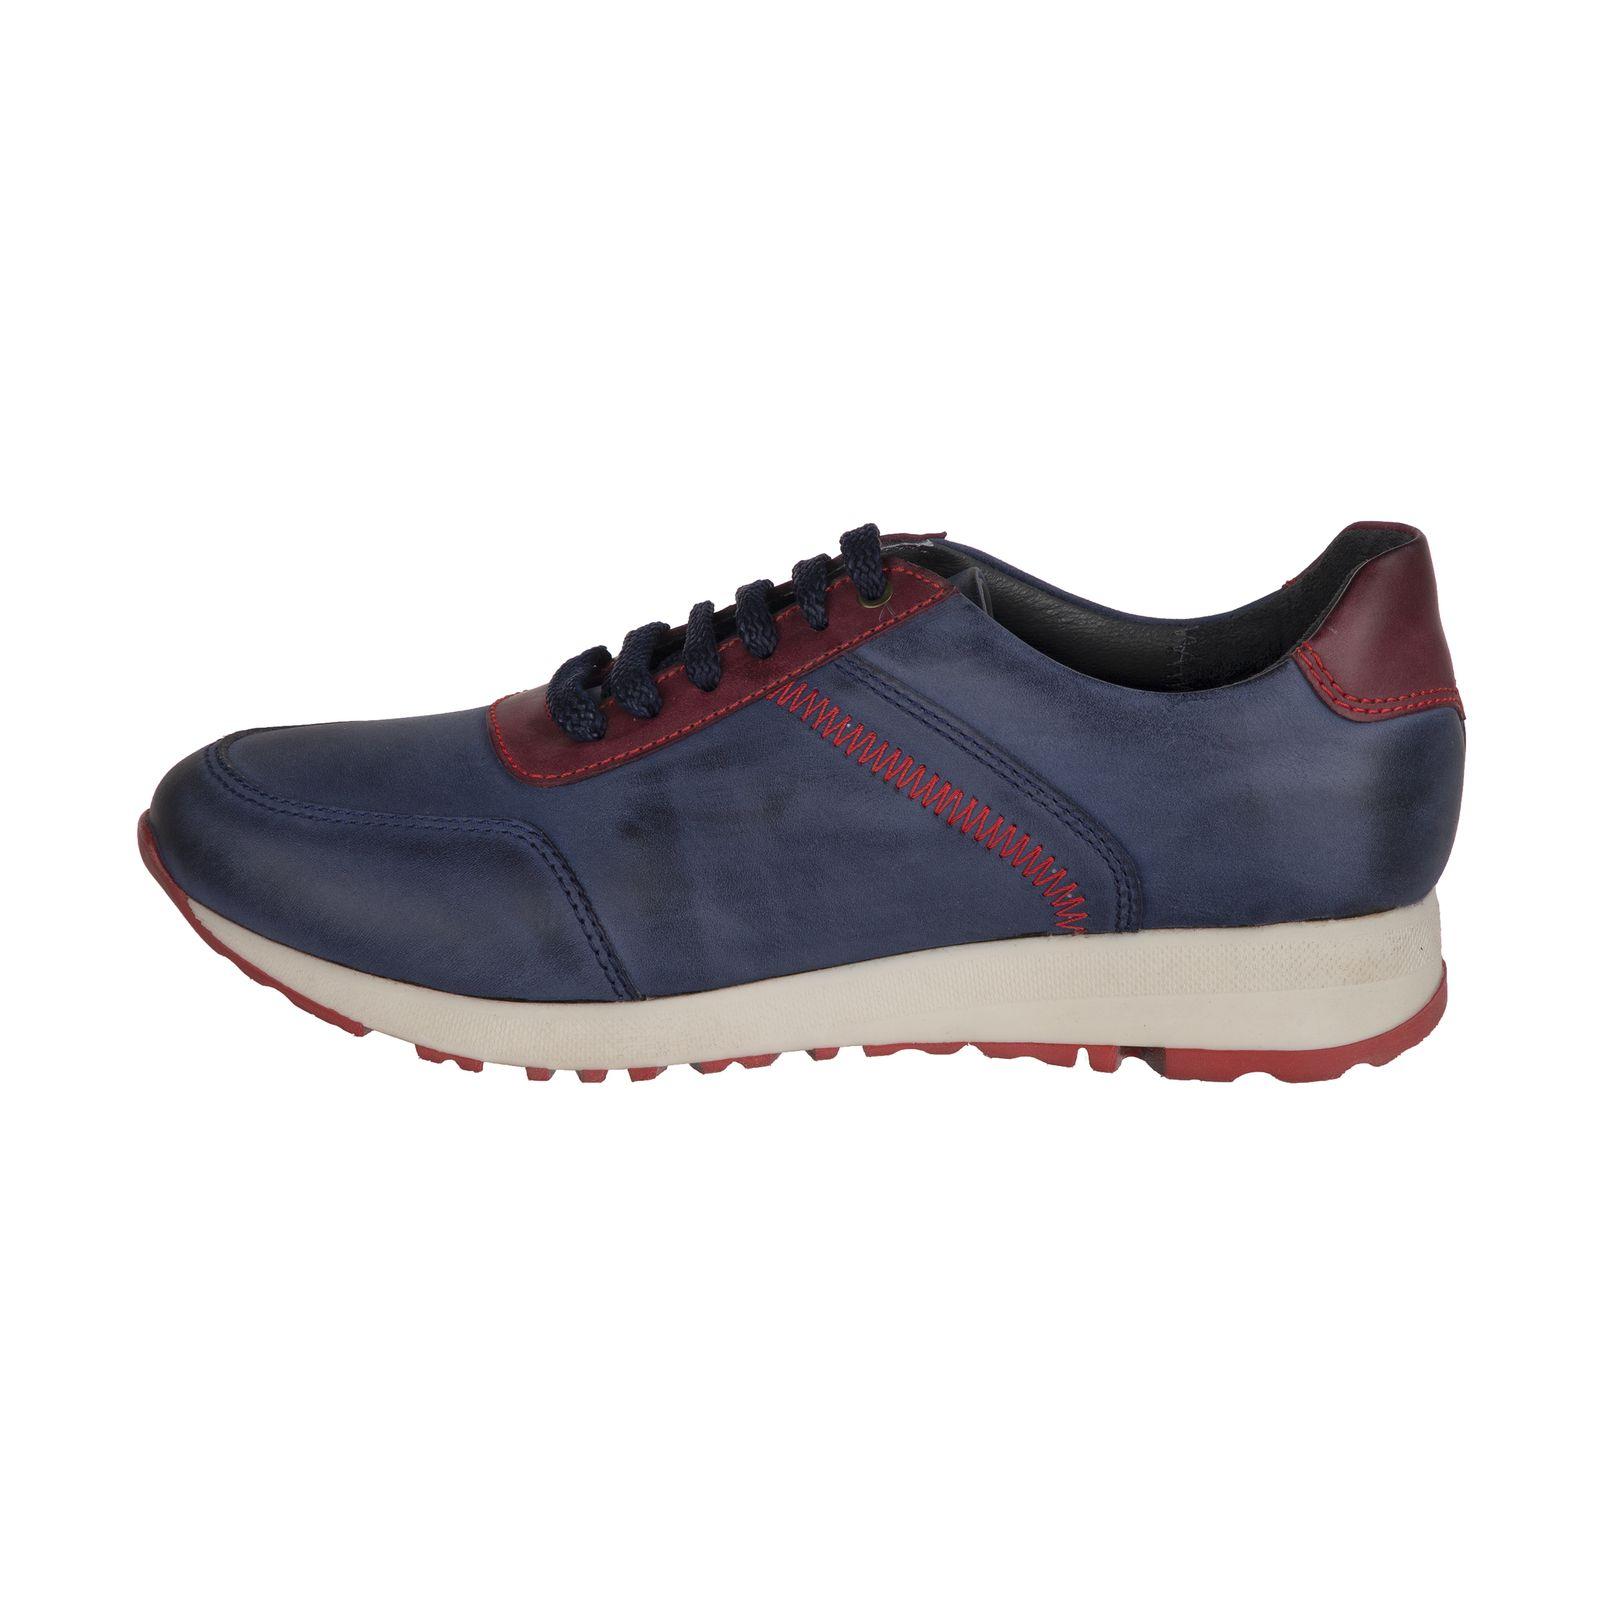 کفش روزمره زنانه سوته مدل 3092A500103 -  - 2